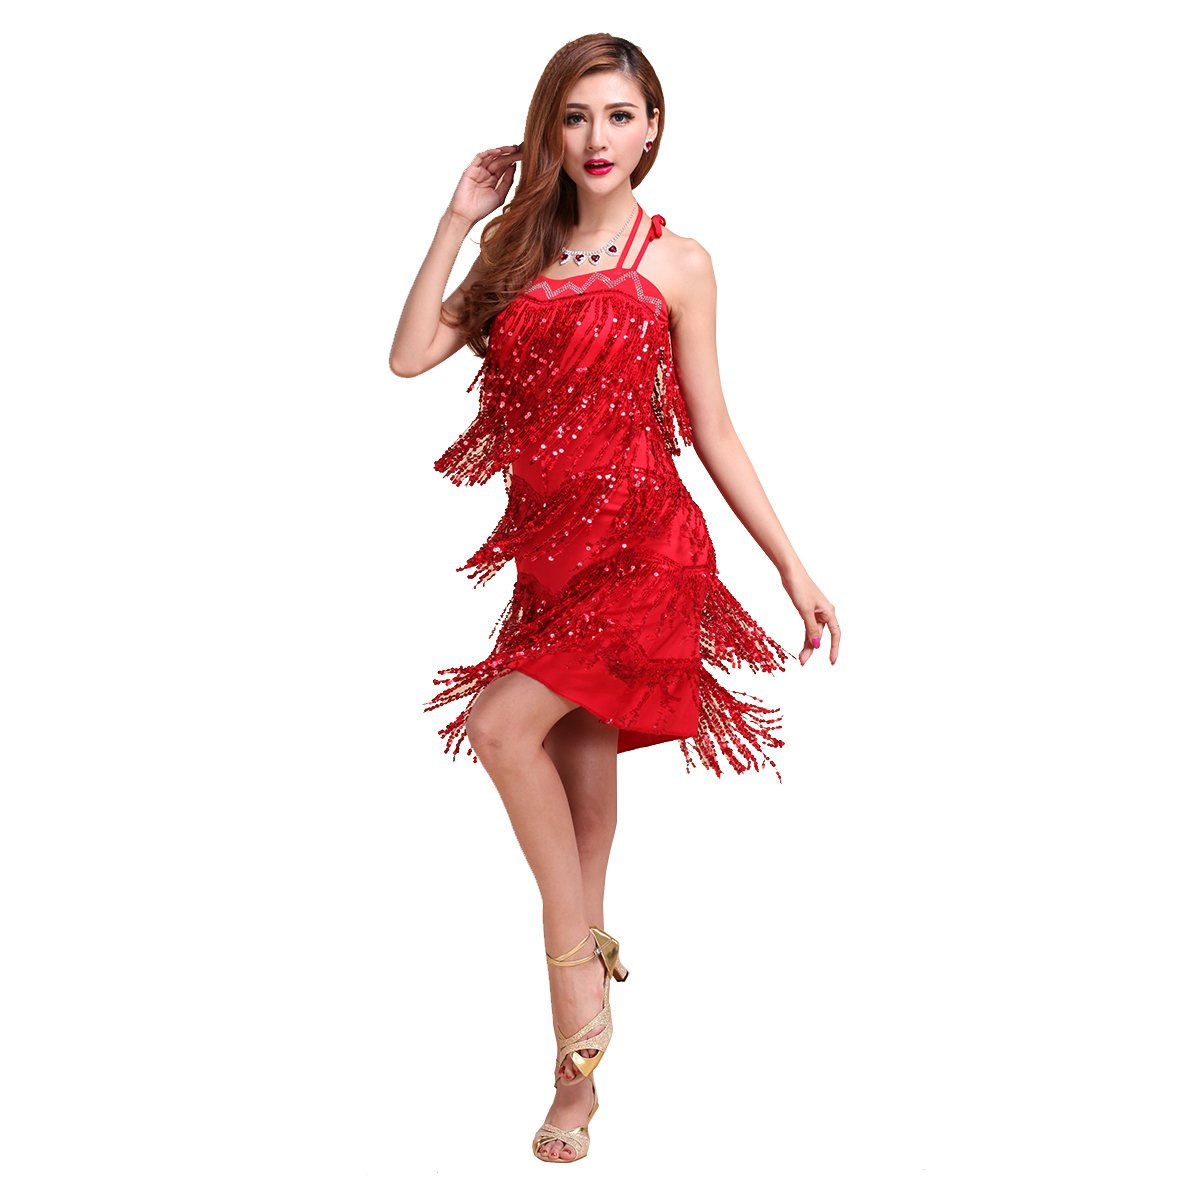 Danza De Latín CoastaCloud Tango Samba Swing Flecos Estilo Nueva Mujer traje vestido Traje Moderno L...